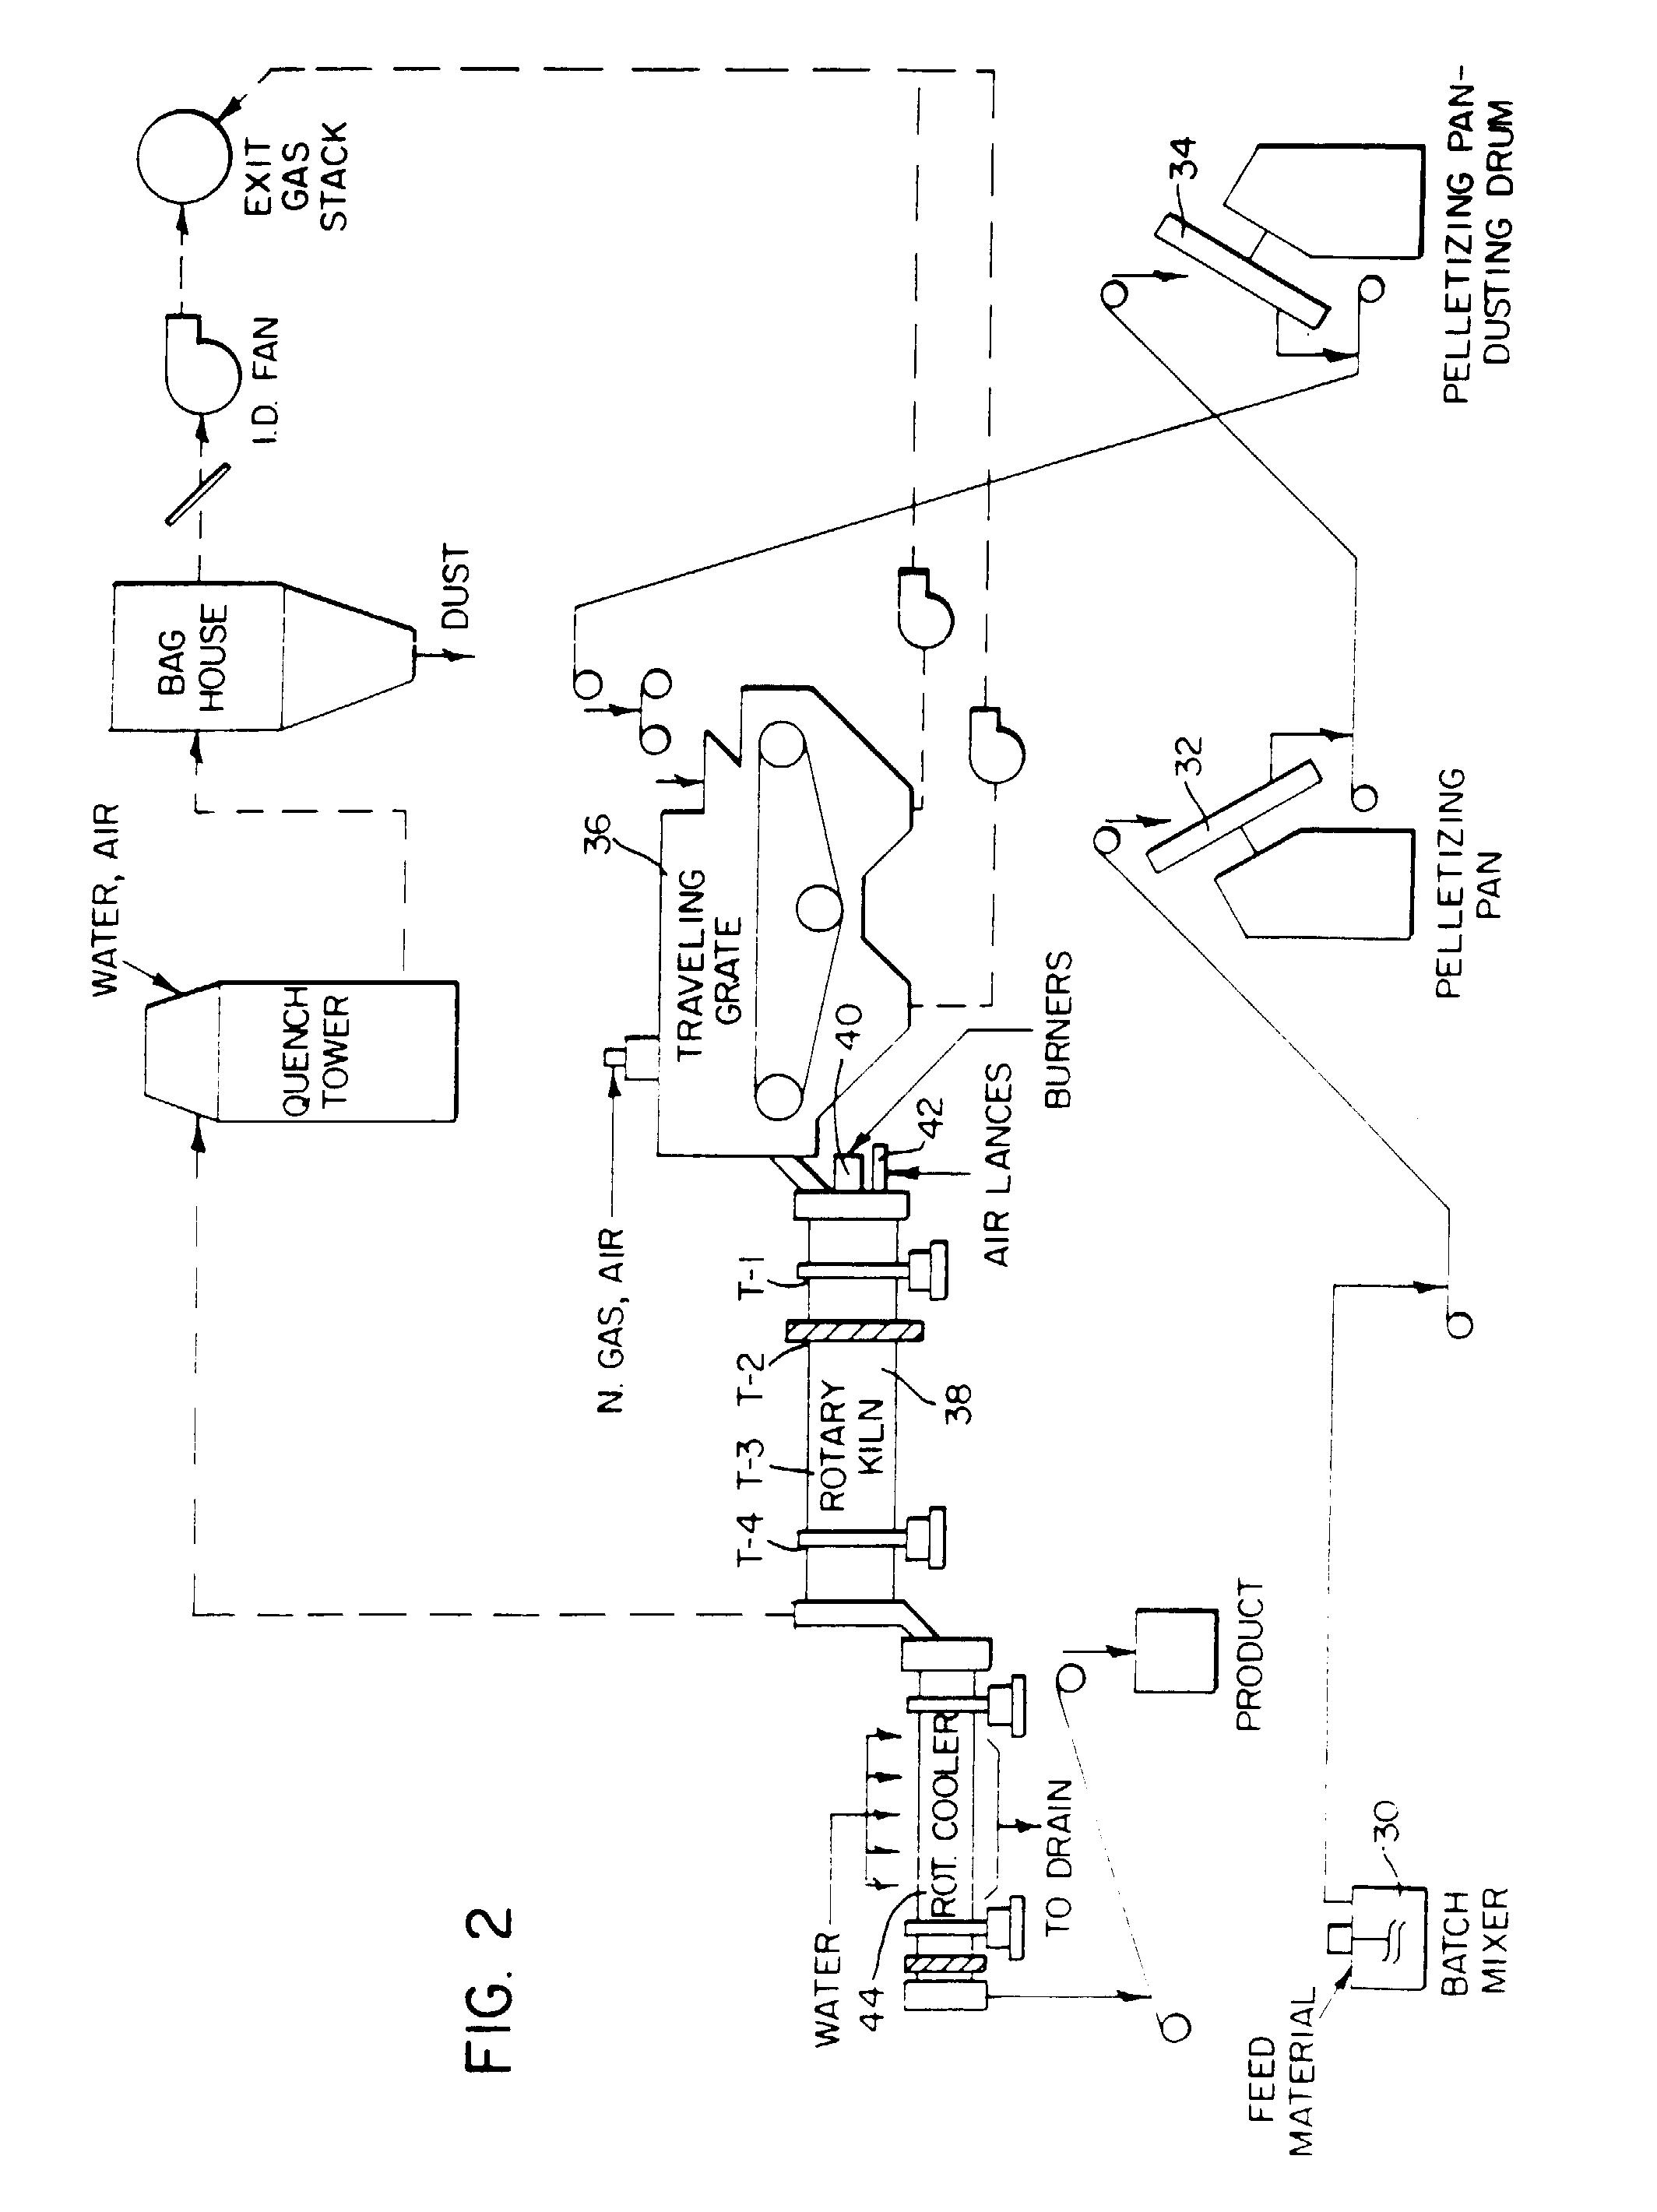 ... wiring diagram for kiln sitter kiln ceramic wire wiring Bailey Kiln  Company Gas Kilns for Pottery